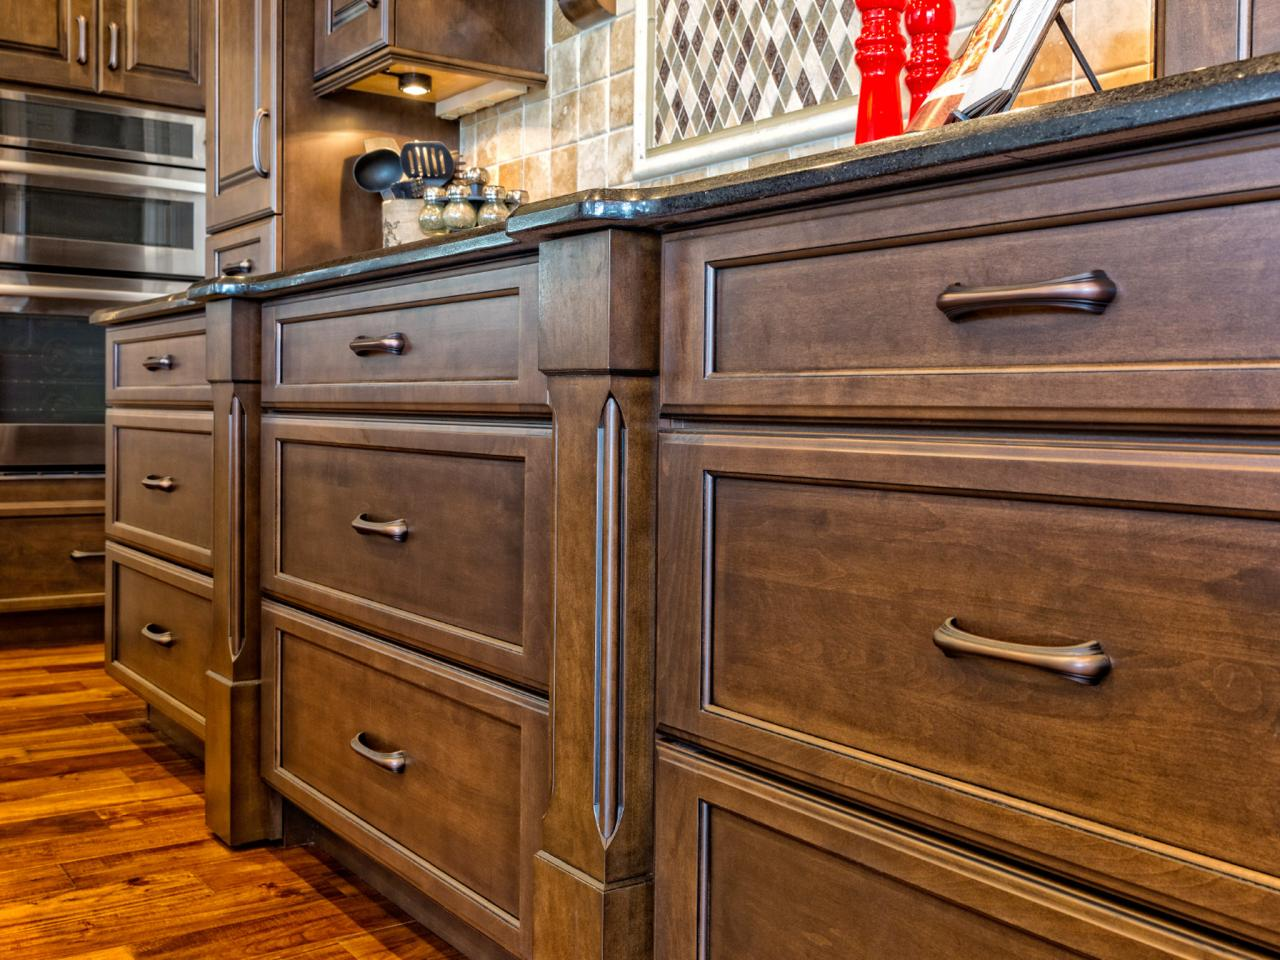 tambahan rak dapur kayu pada sisi bawah lemari elegan